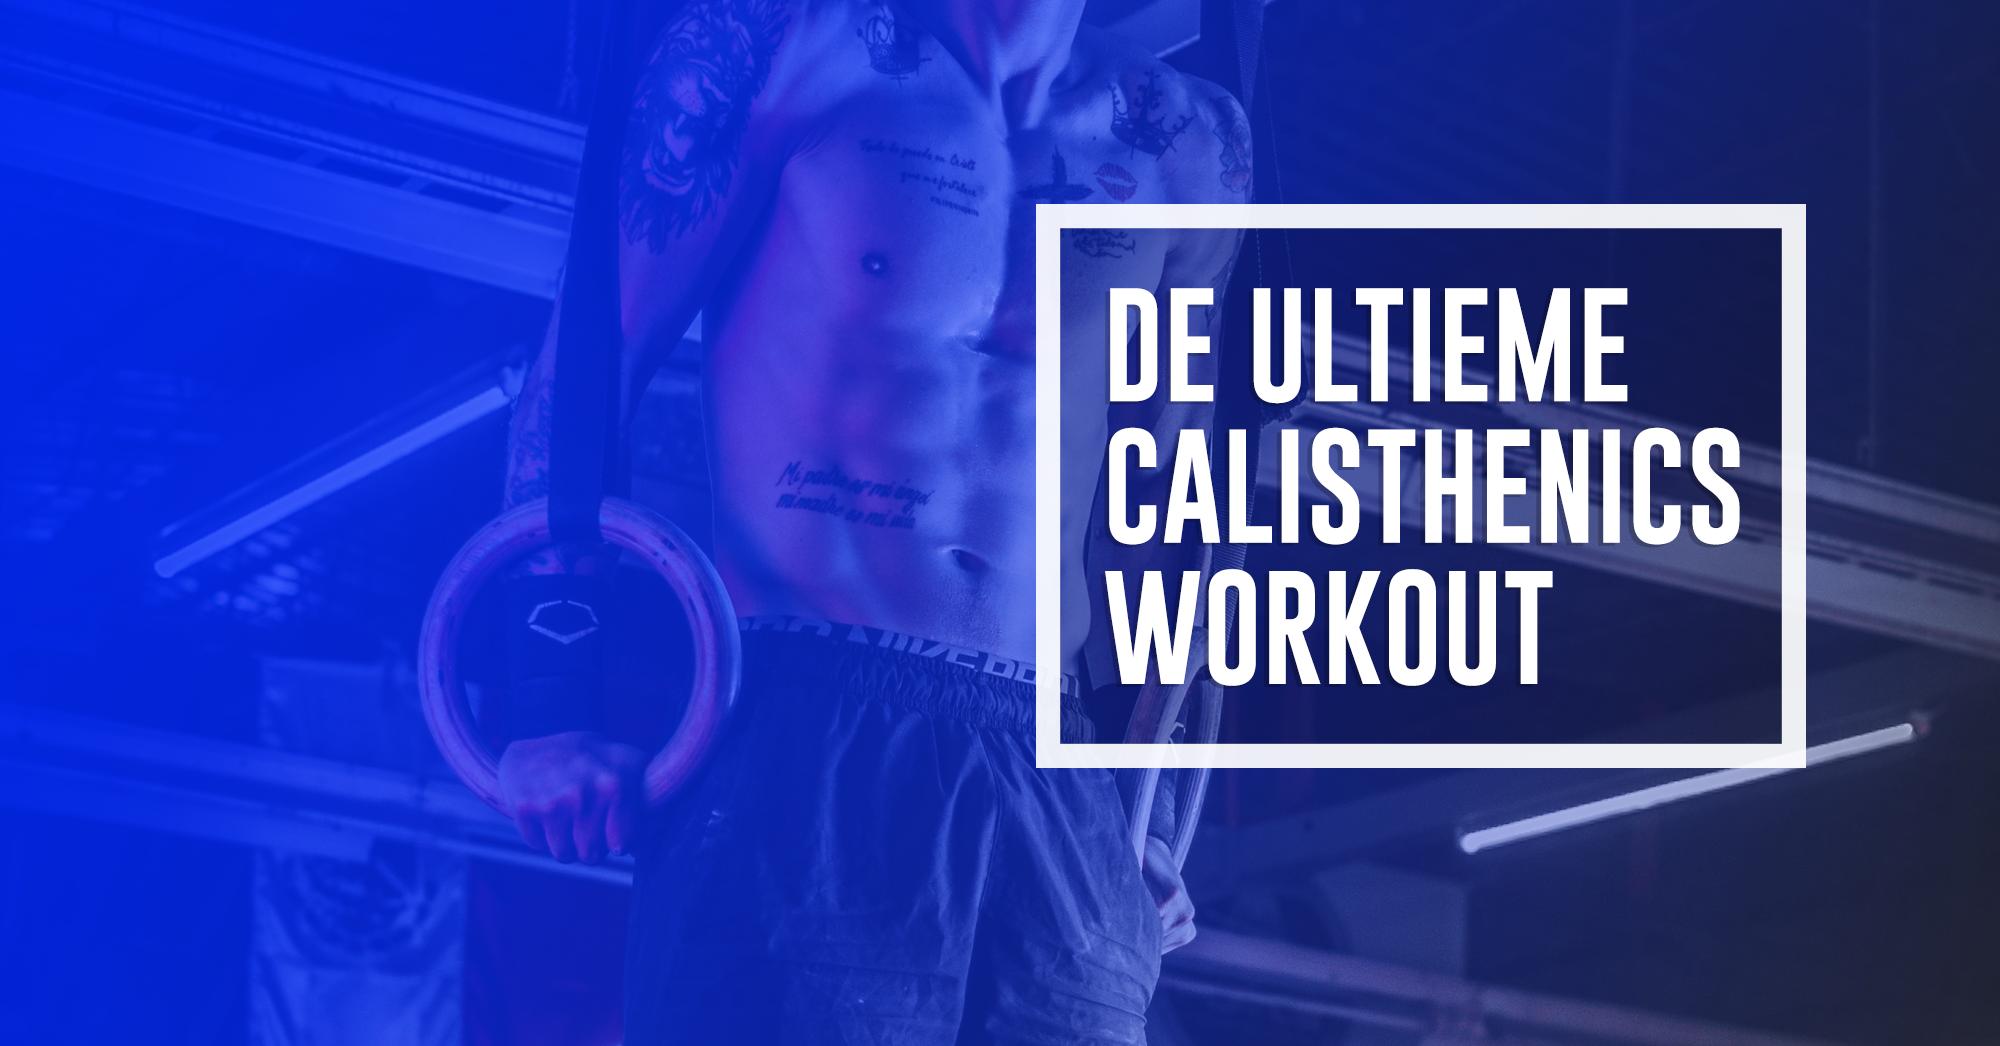 De ultieme calisthenics workout